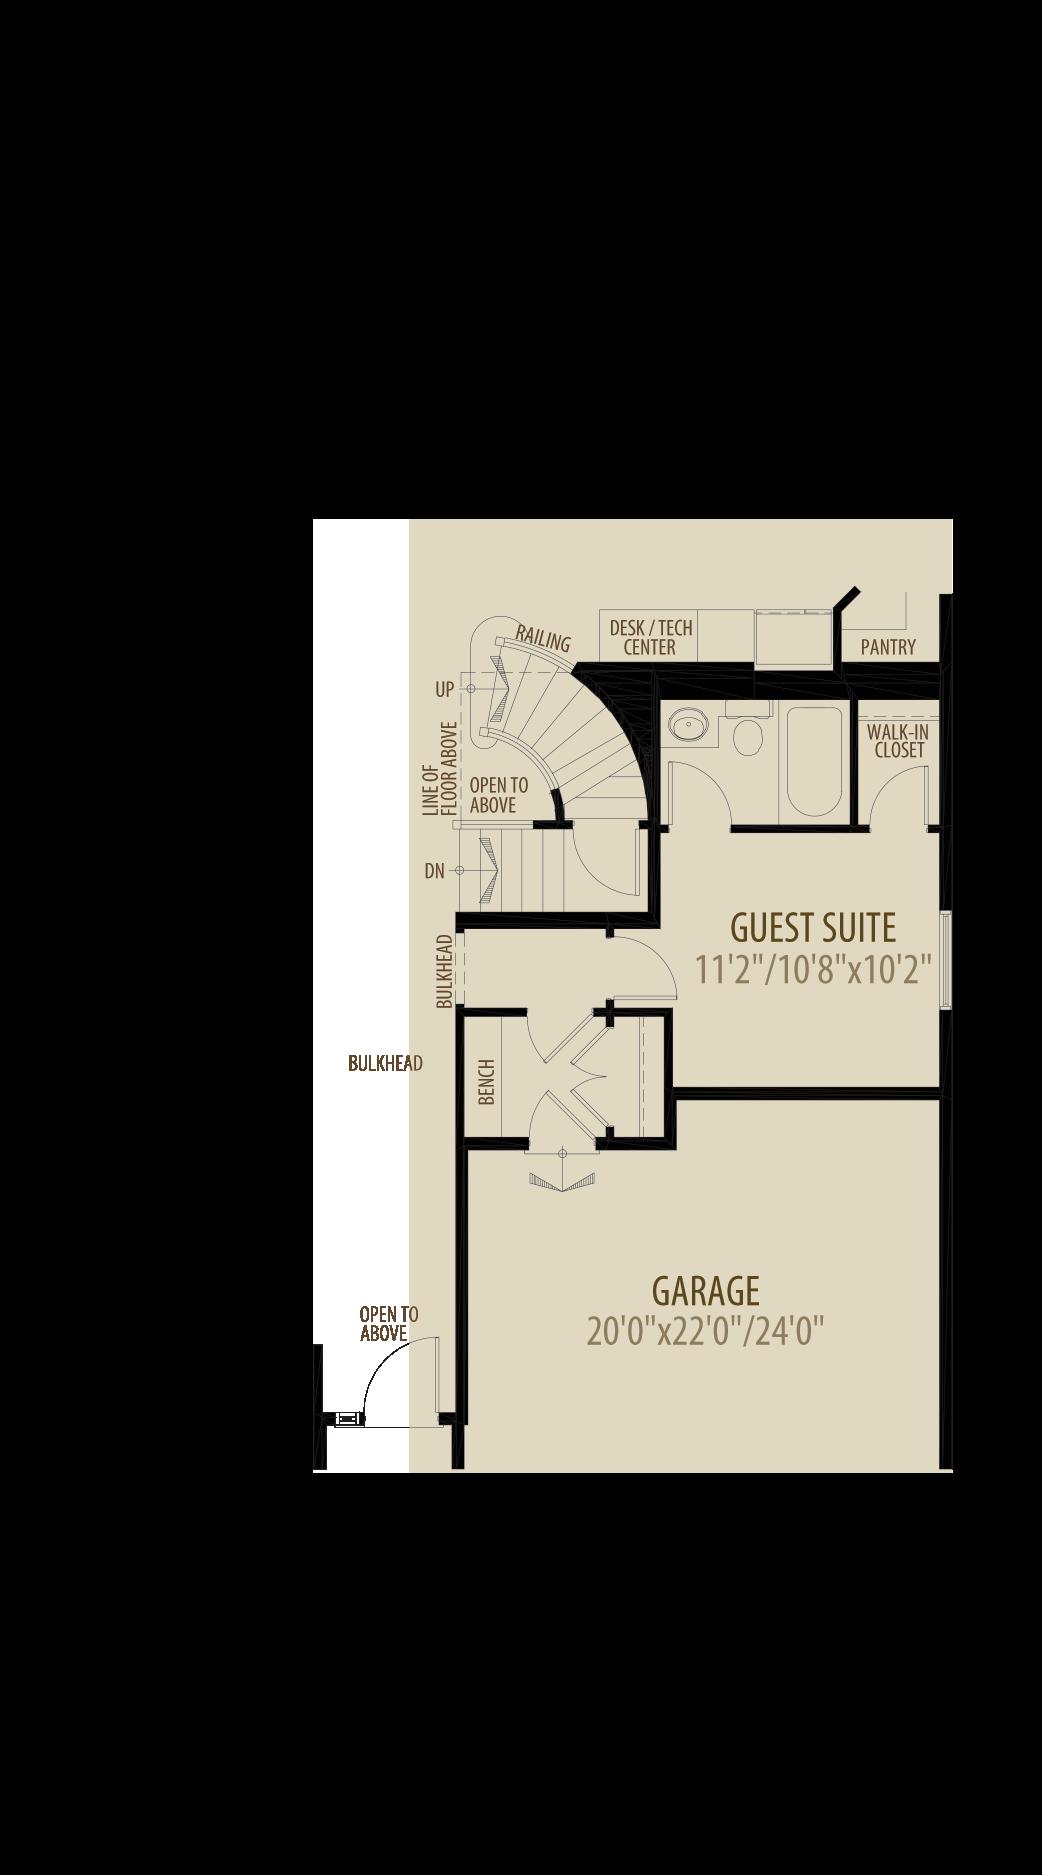 Option 2 Guest Suite adds 176sq ft